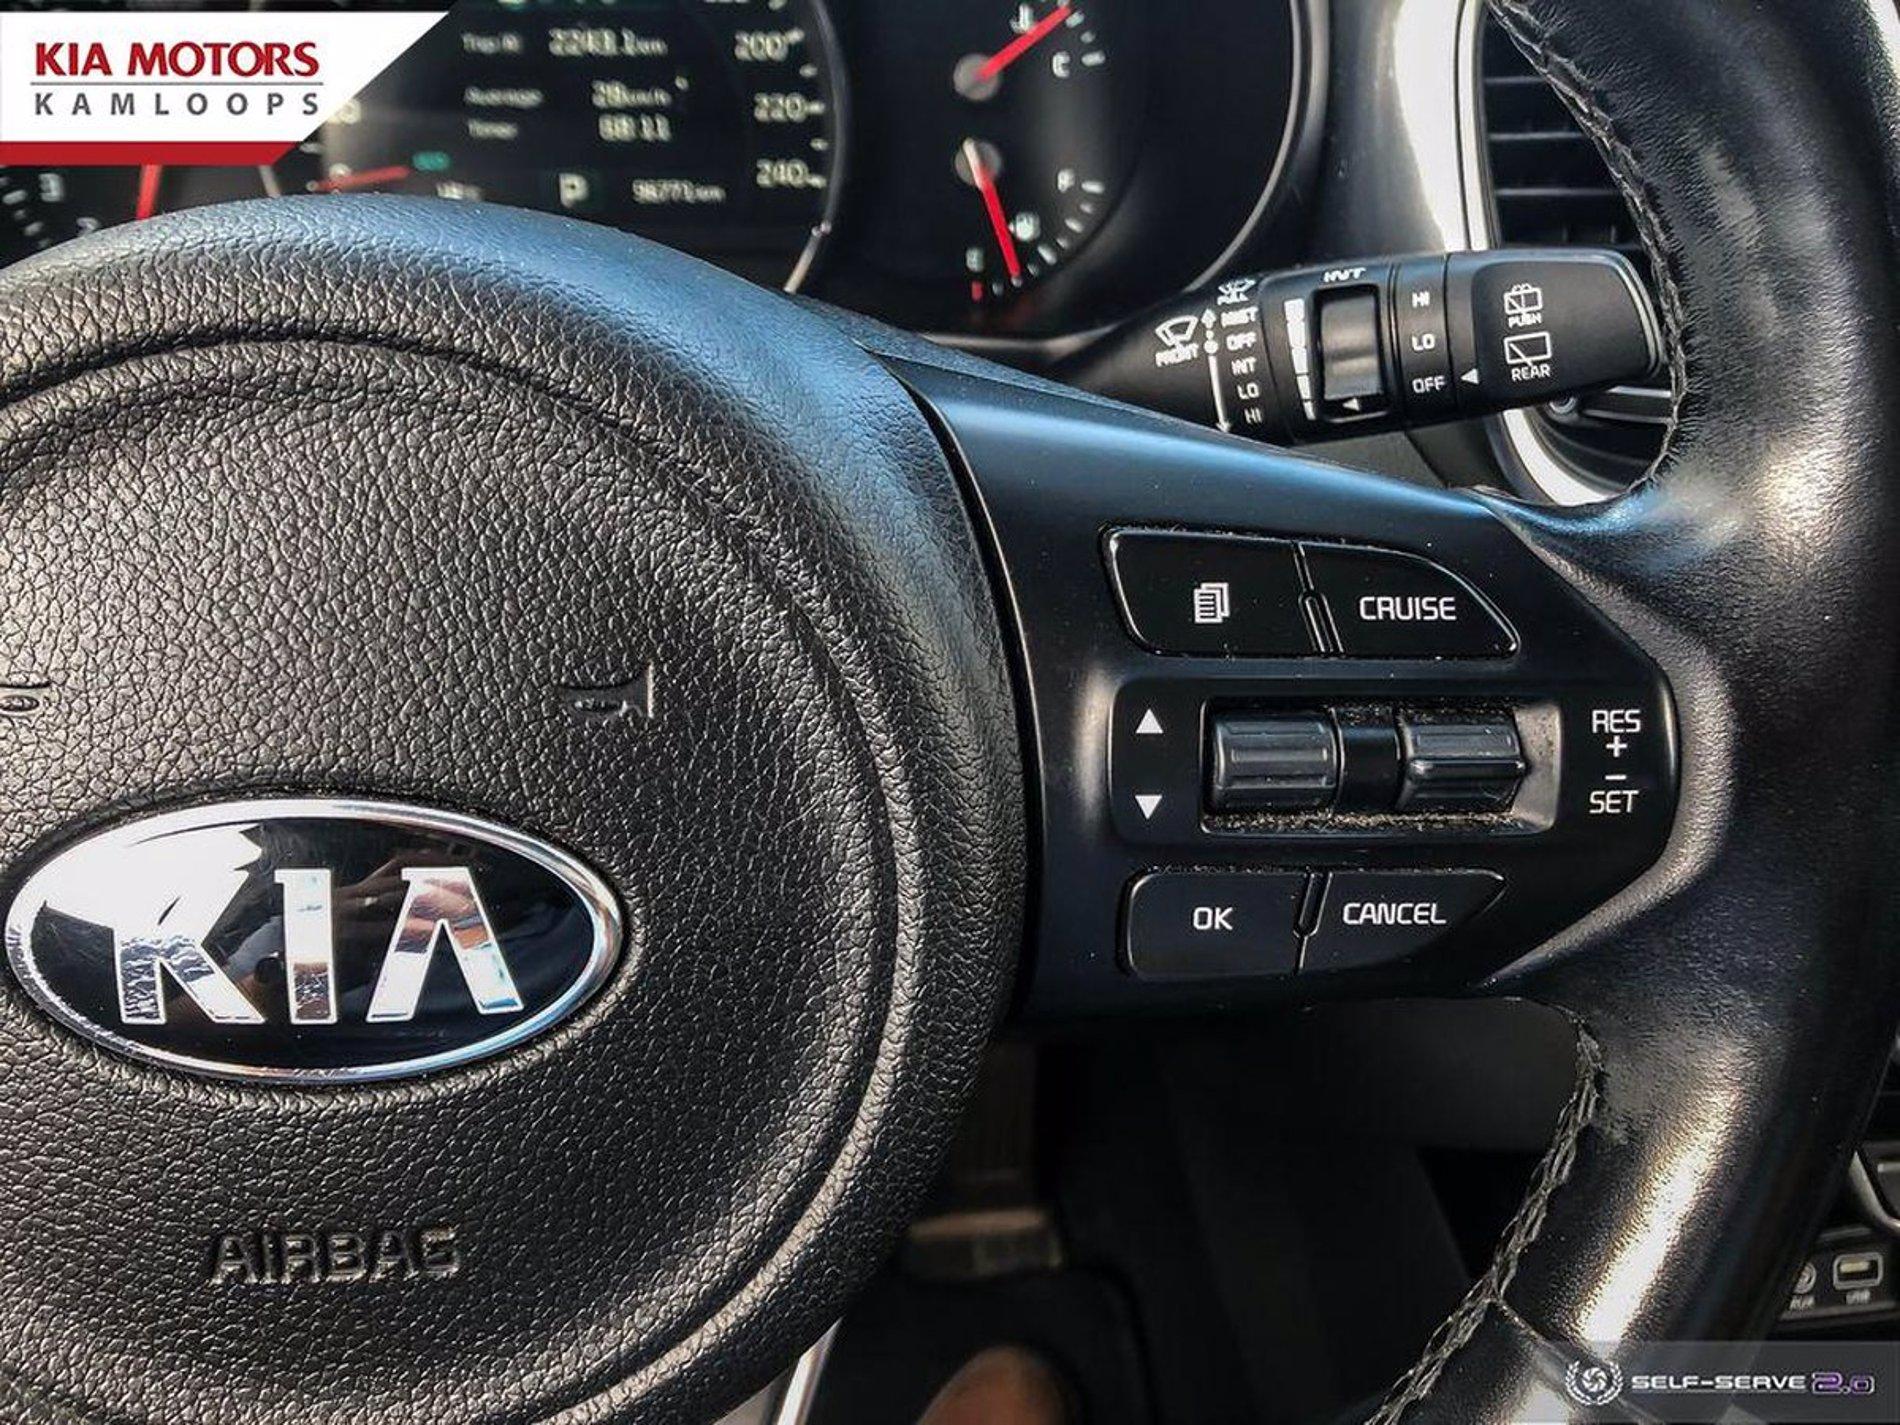 Used 2016 Kia Sorento EX AWD 4dr 2.0T EX at AutoNow - Your FRIENDLY Auto Credit Solution